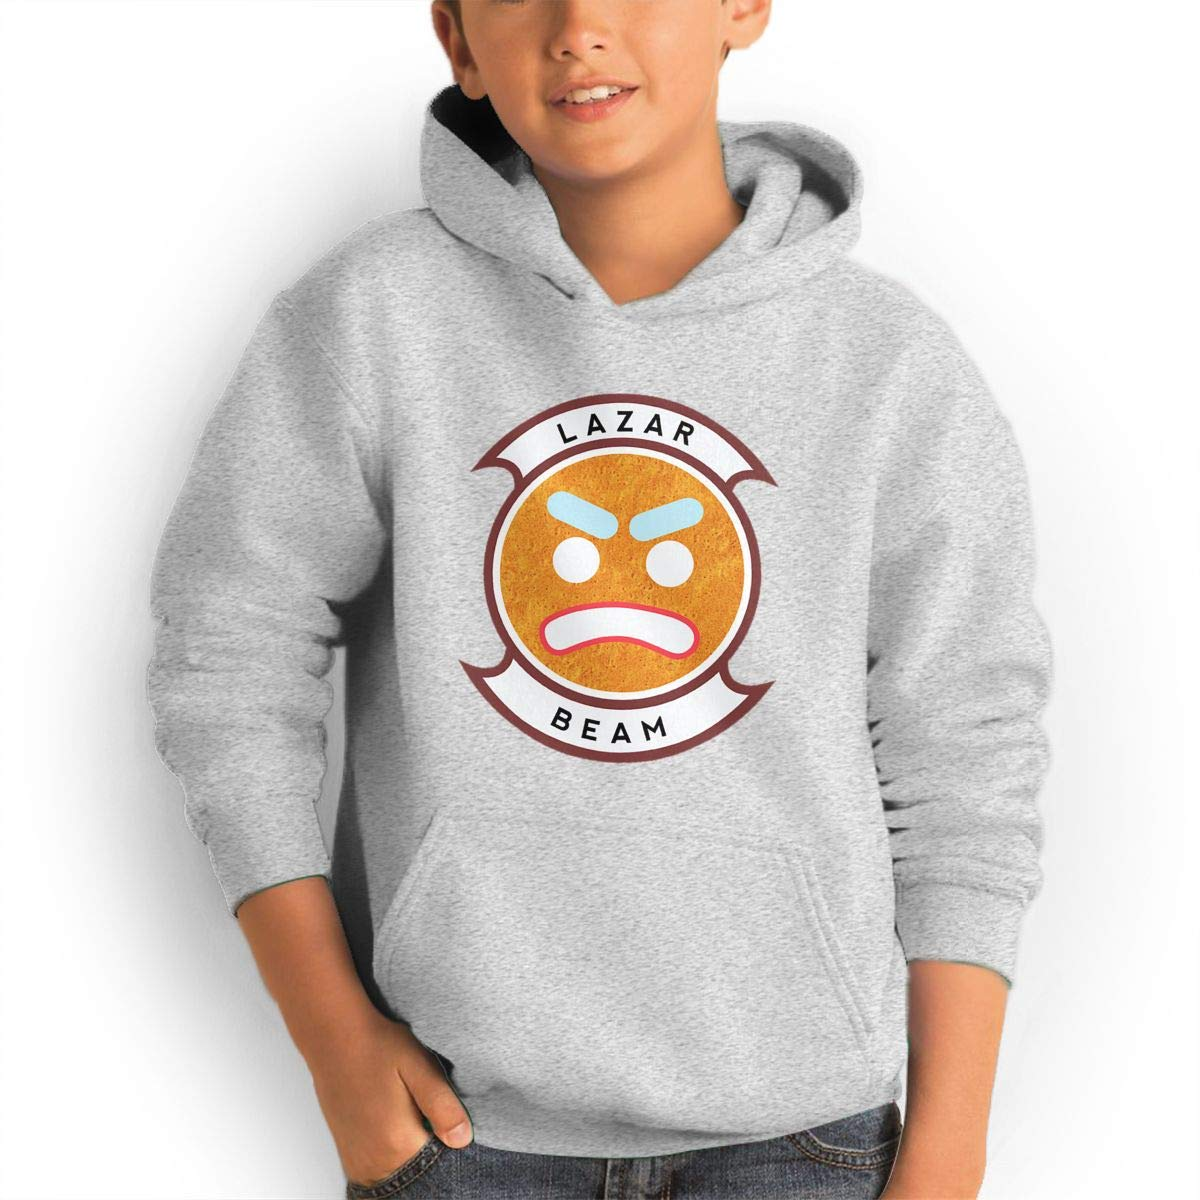 Red Coffee Teen Fashion Hoodie Hooded Sweatshirt Pocket Youth Boys Girls Sweaters,LazarBeam